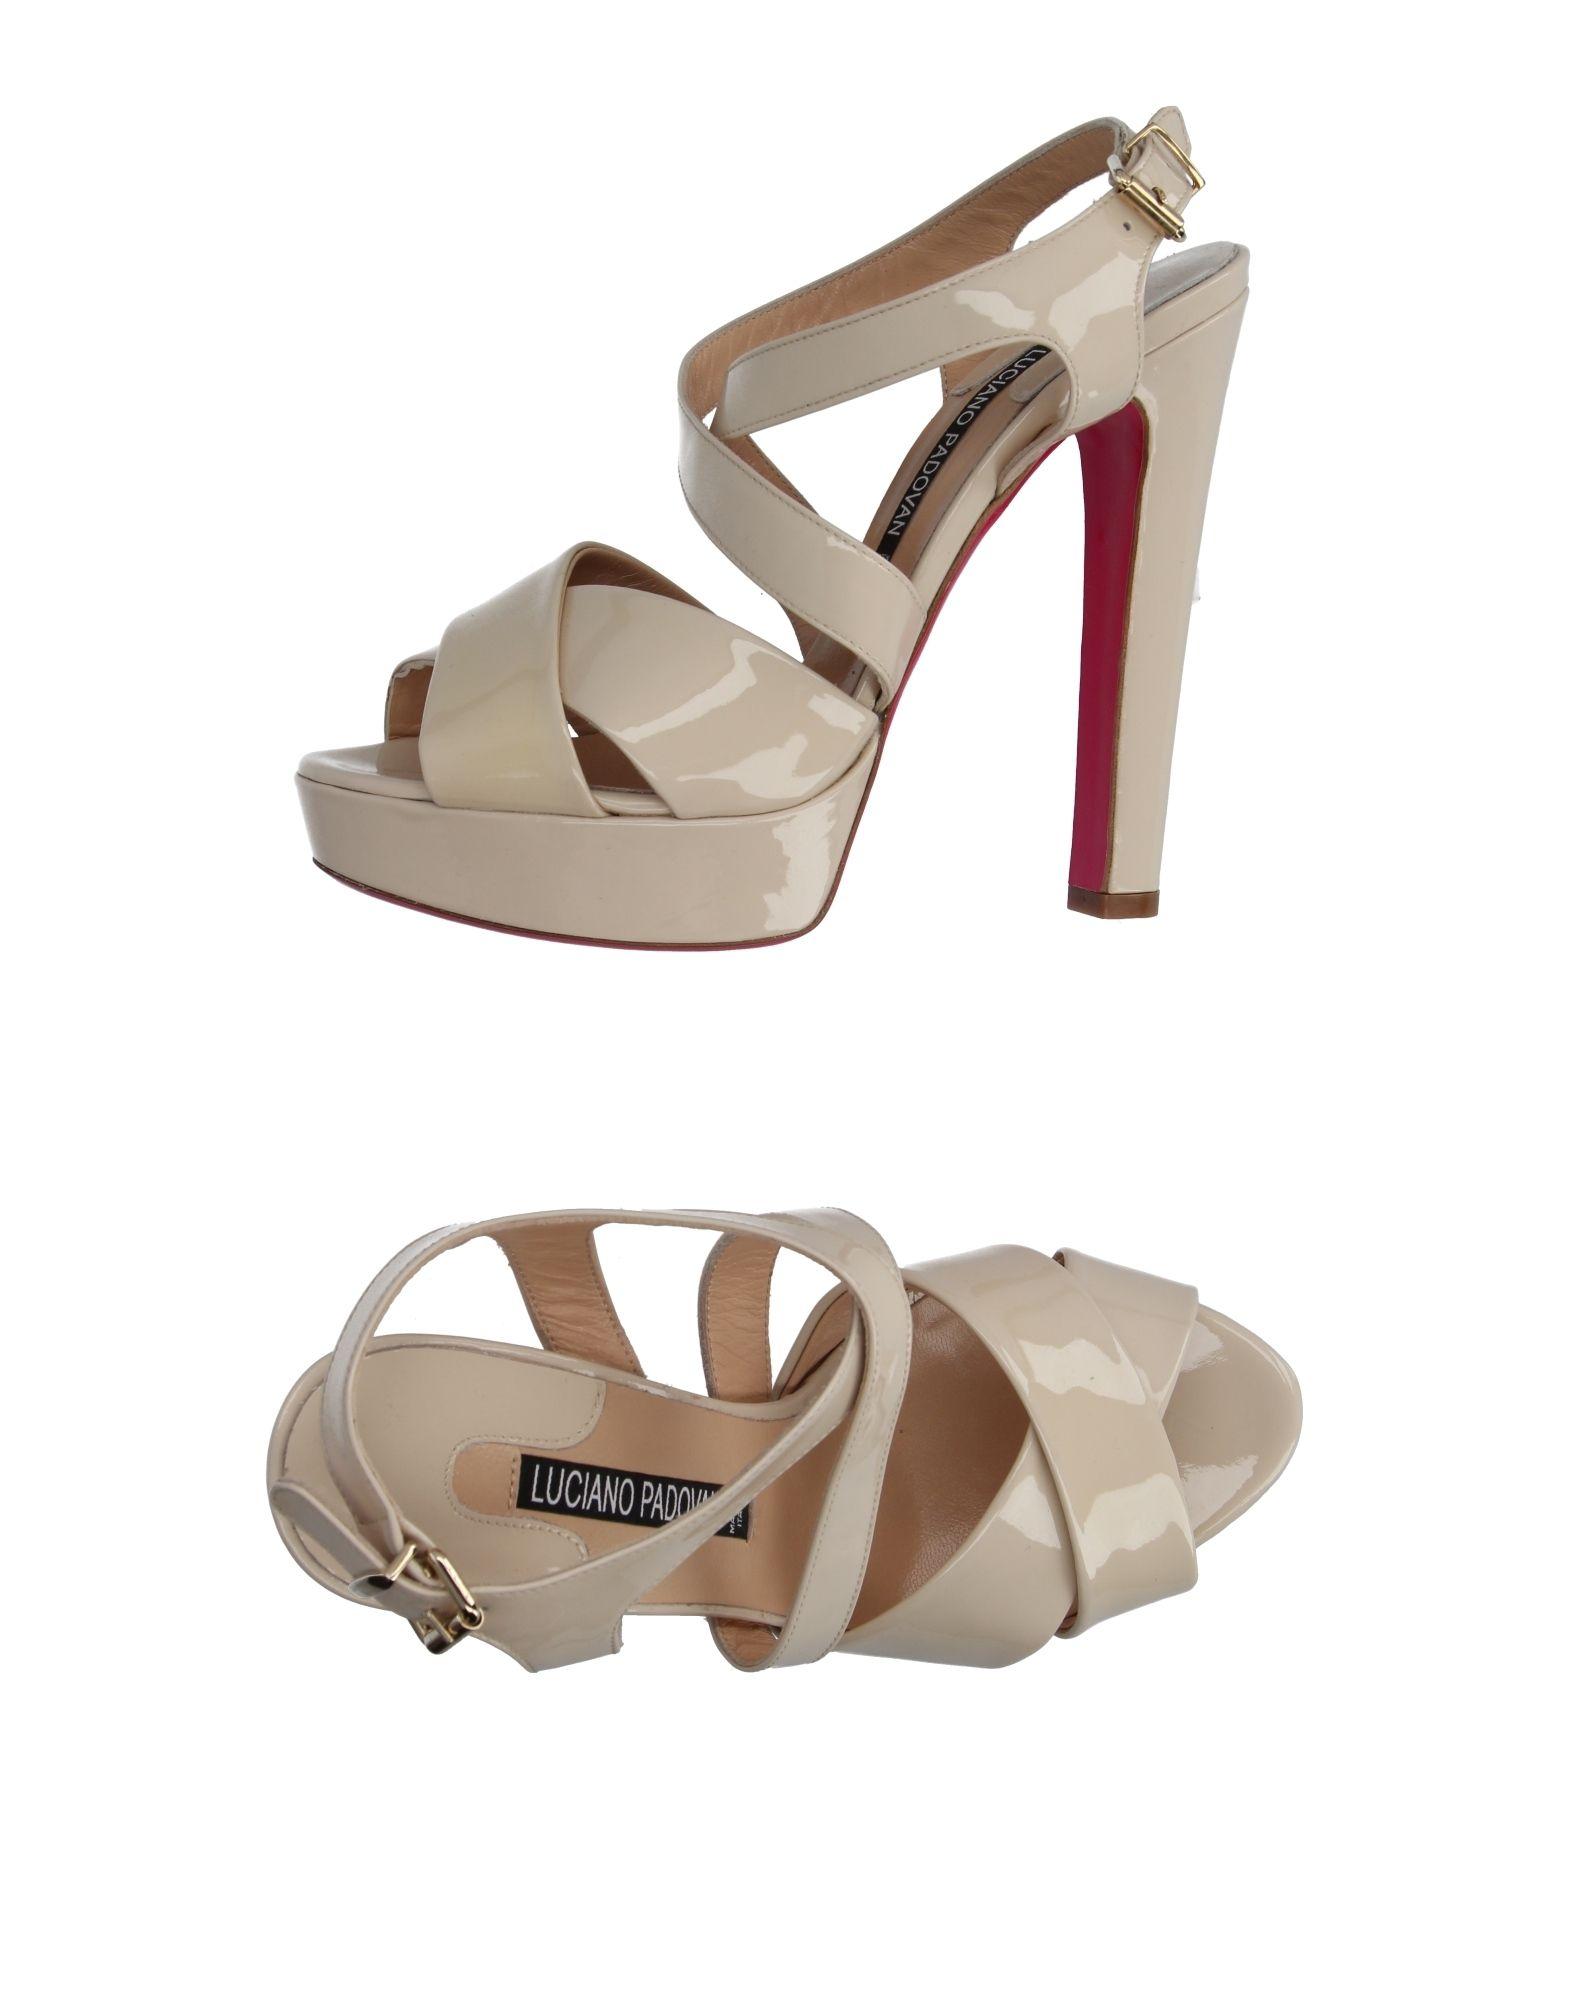 Gut tragenLuciano um billige Schuhe zu tragenLuciano Gut Padovan Sandalen Damen  11039414BQ 32d554